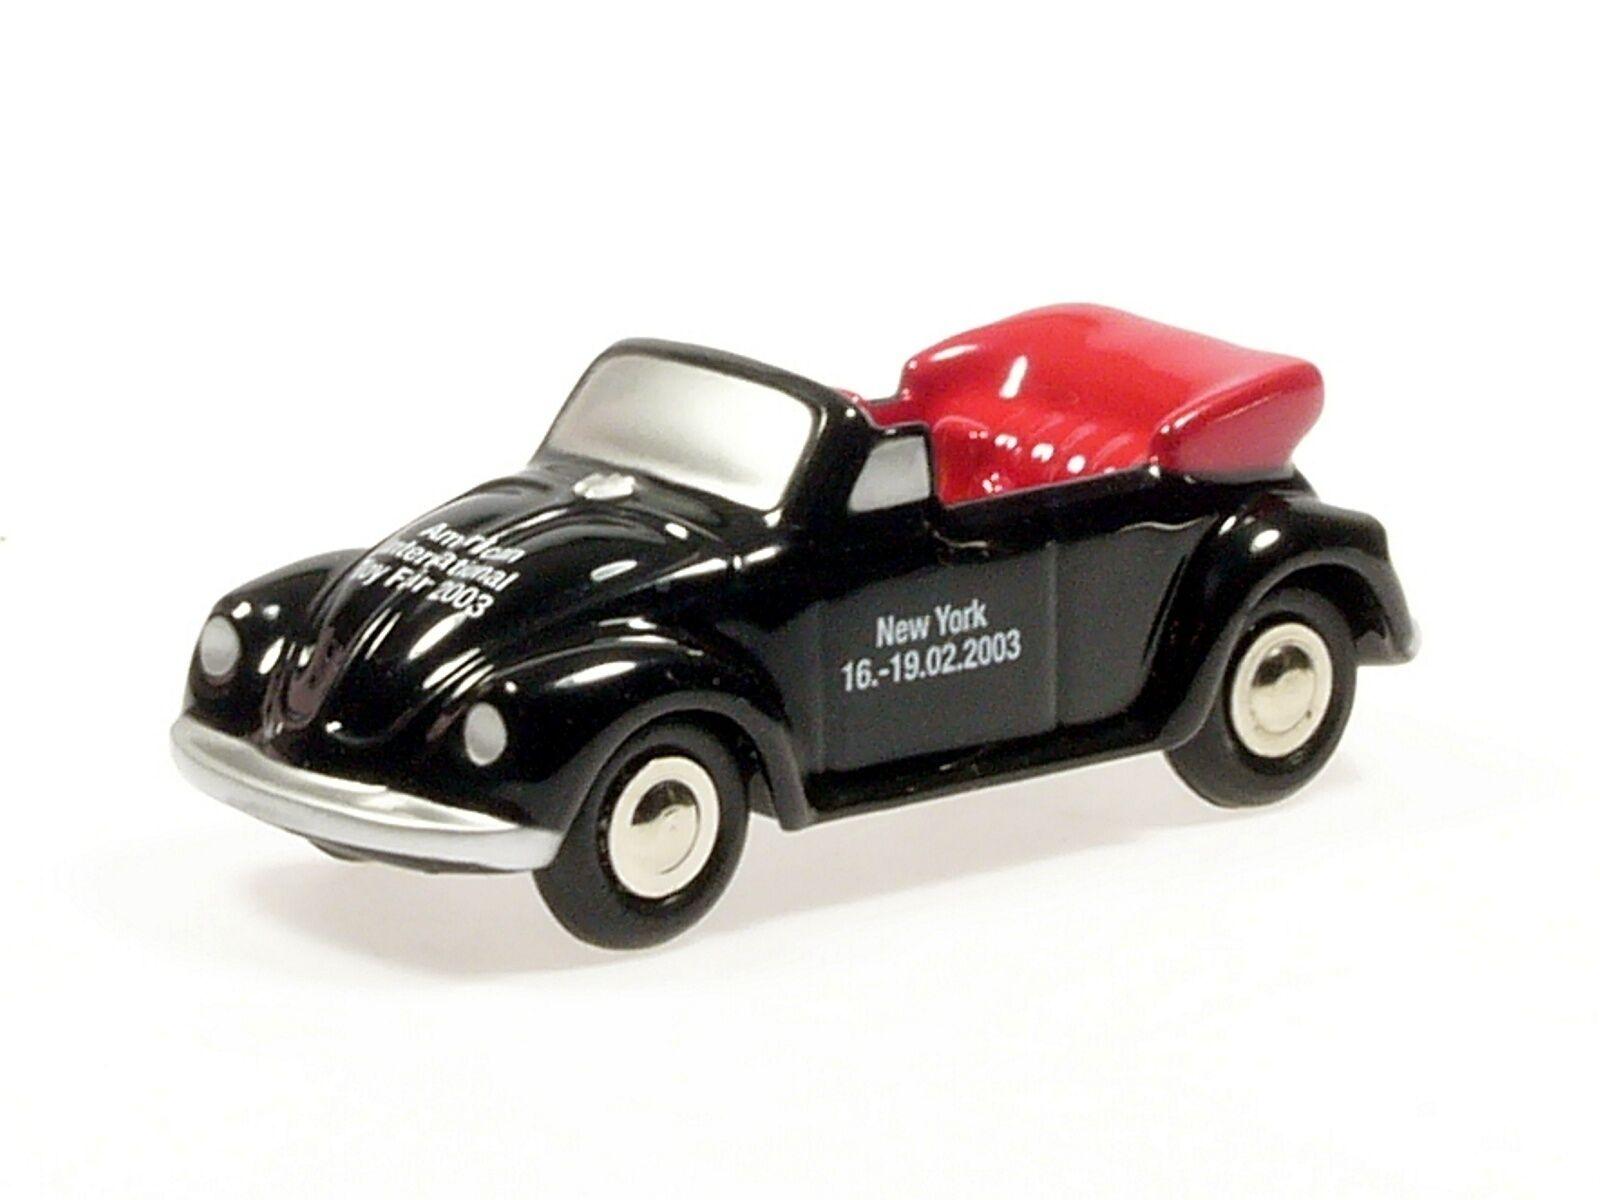 Schuco Piccolo VW Käfer Cabrio New York toy fair 2003